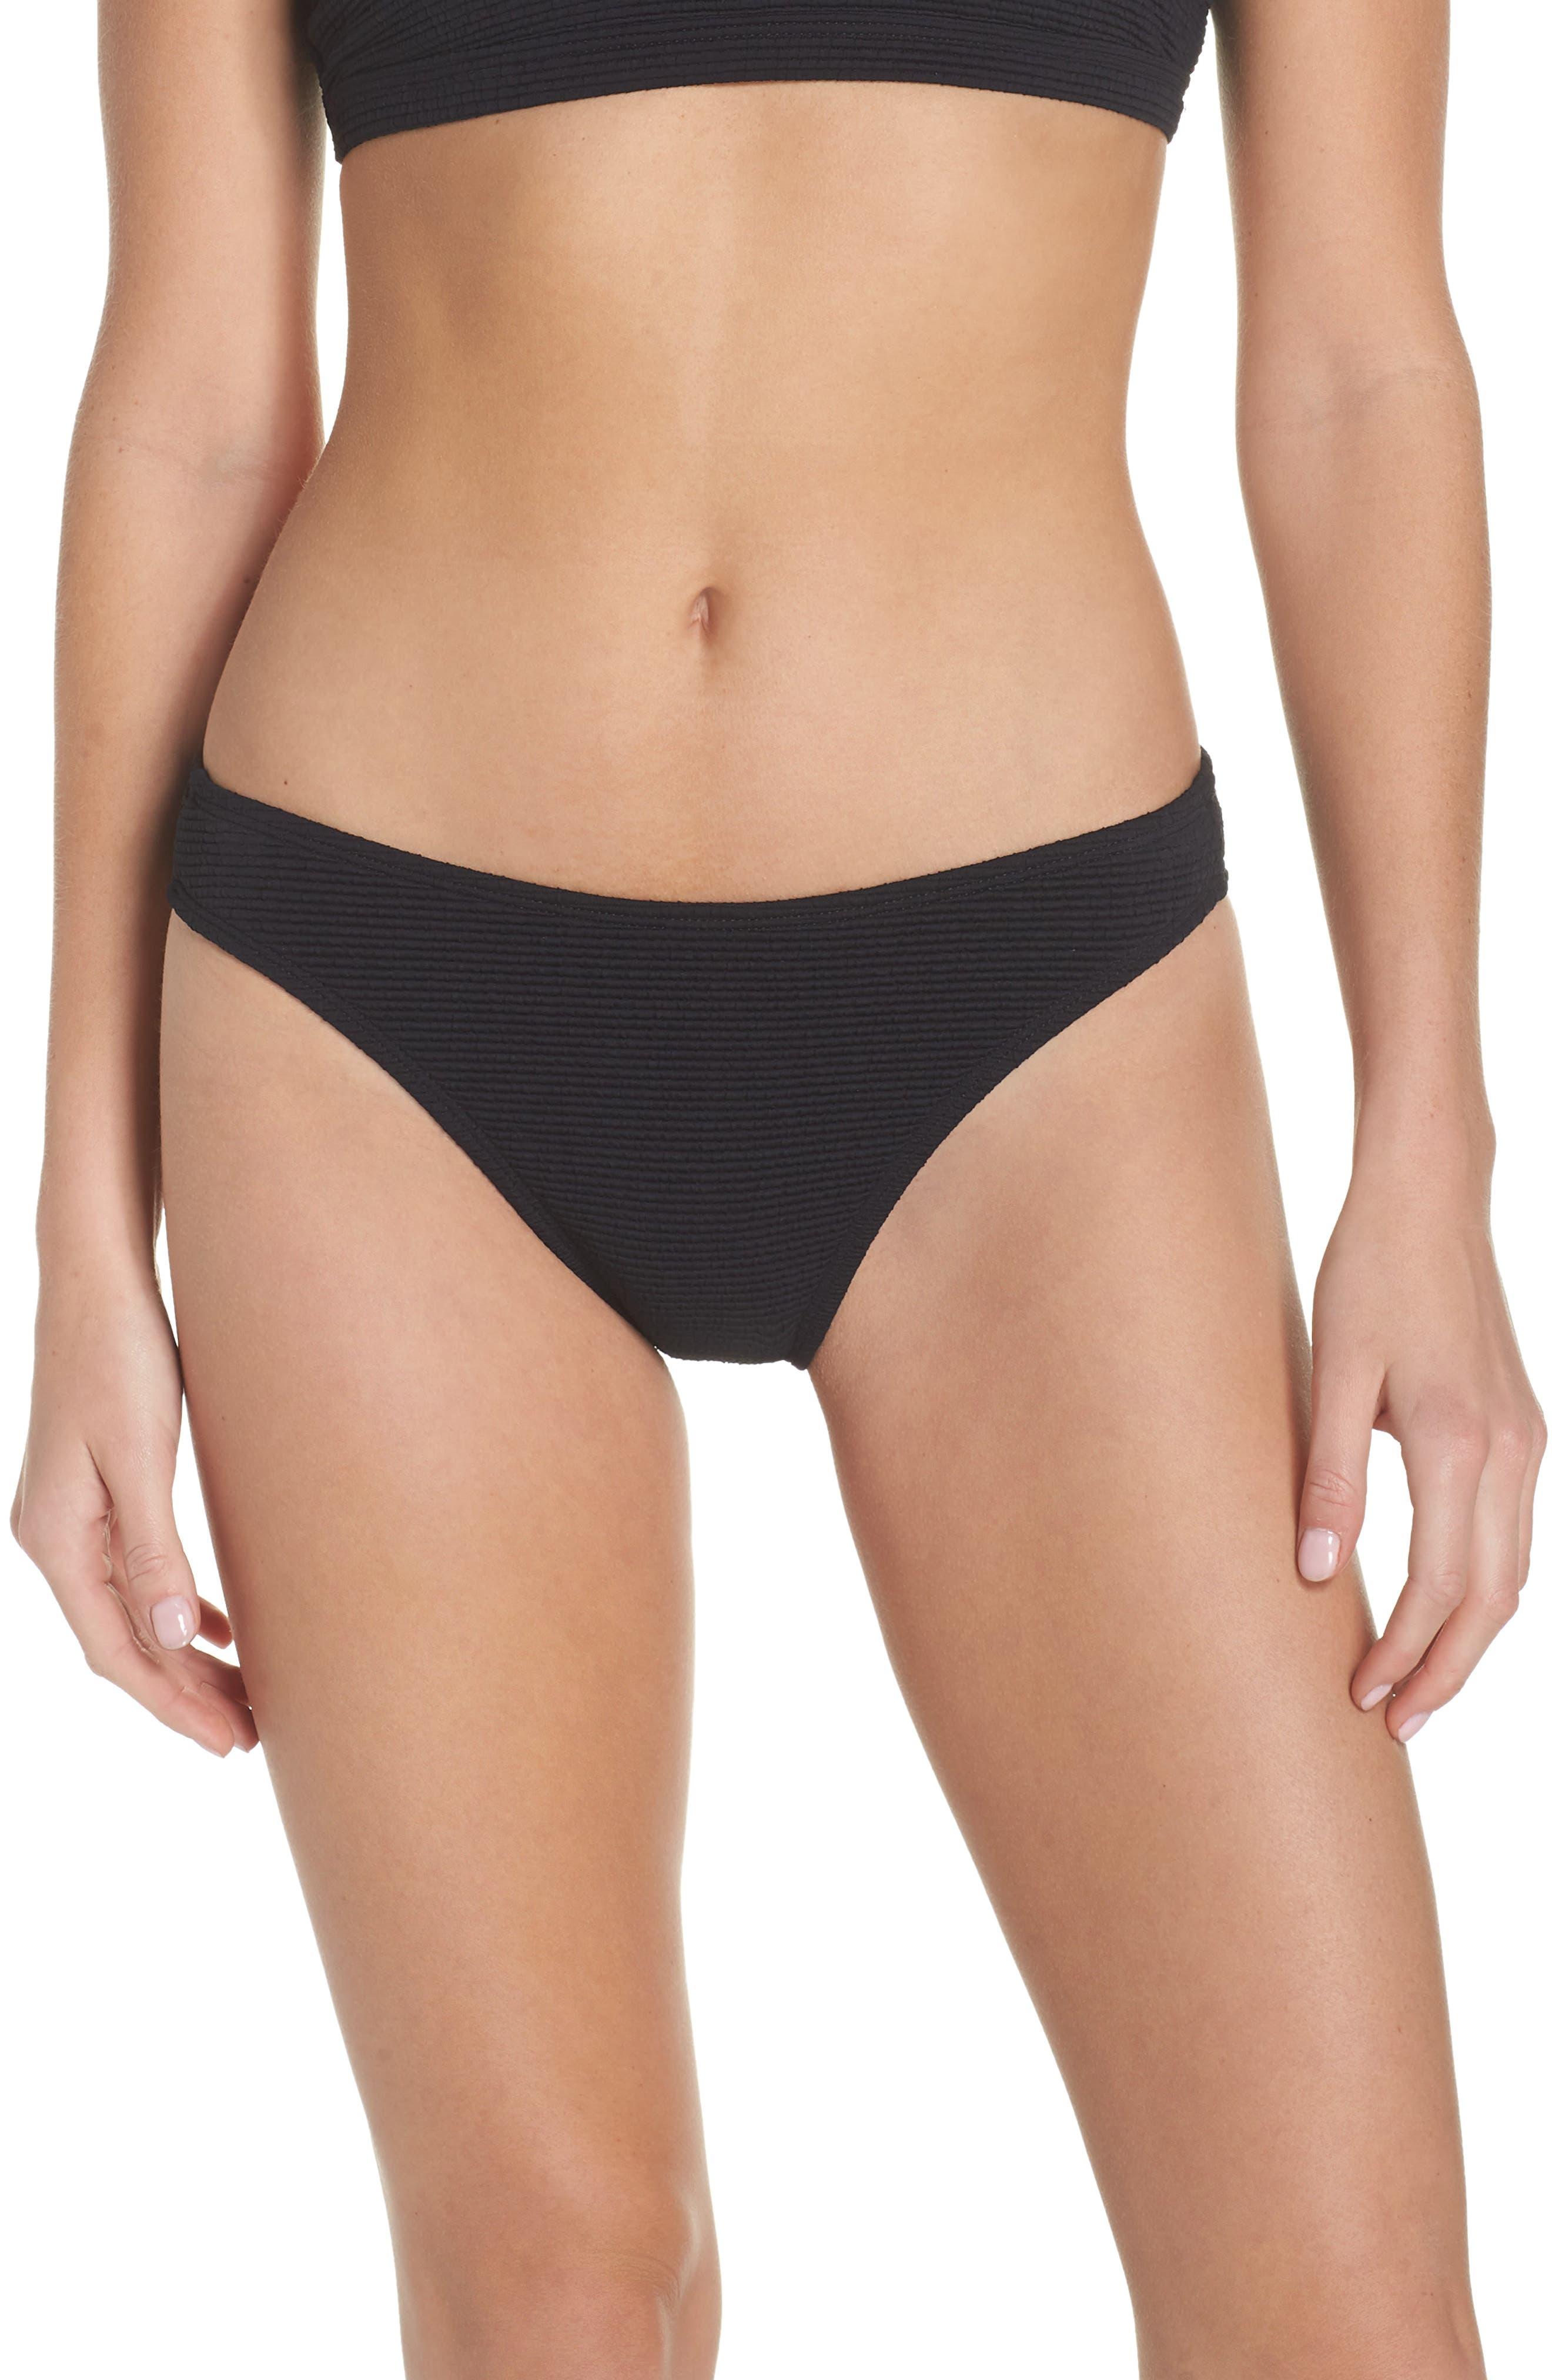 Malibu High Leg Bikini Bottoms,                             Main thumbnail 1, color,                             BLACK